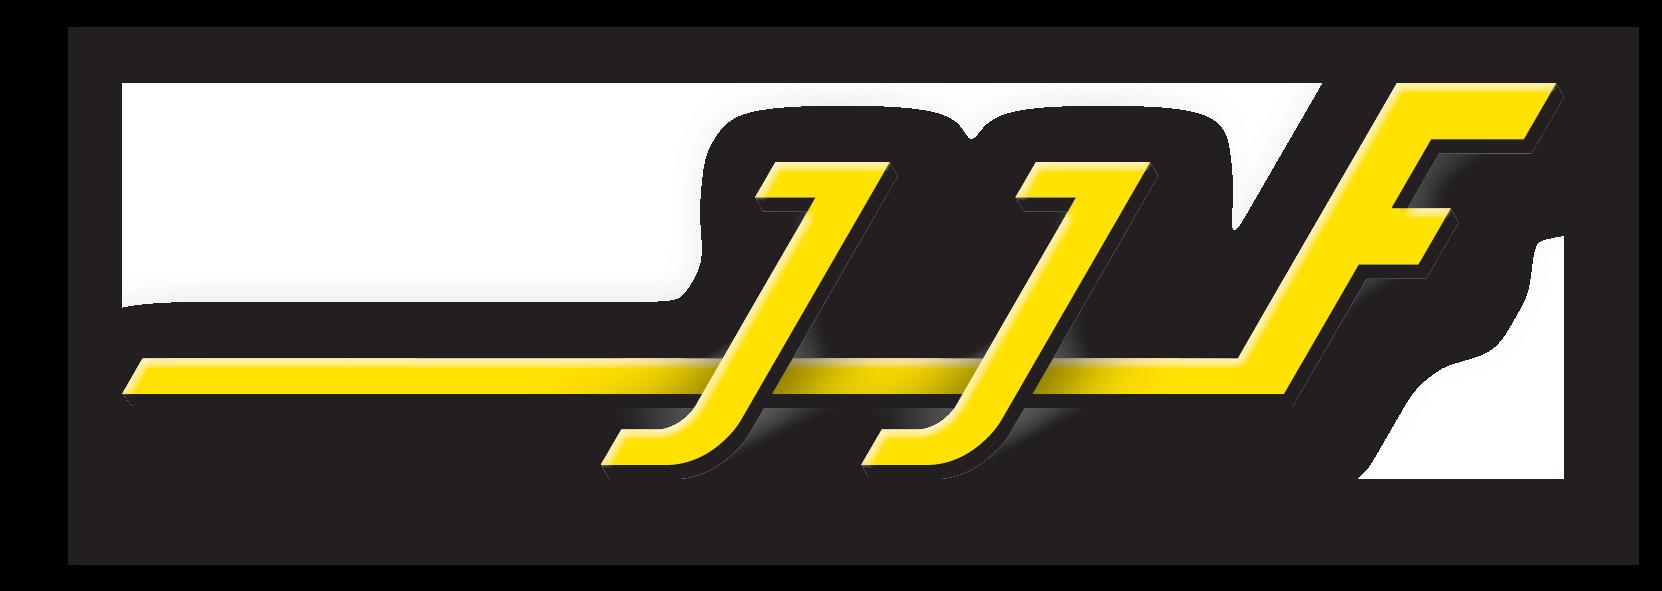 Logo de l'entreprise SARL J.J.F.